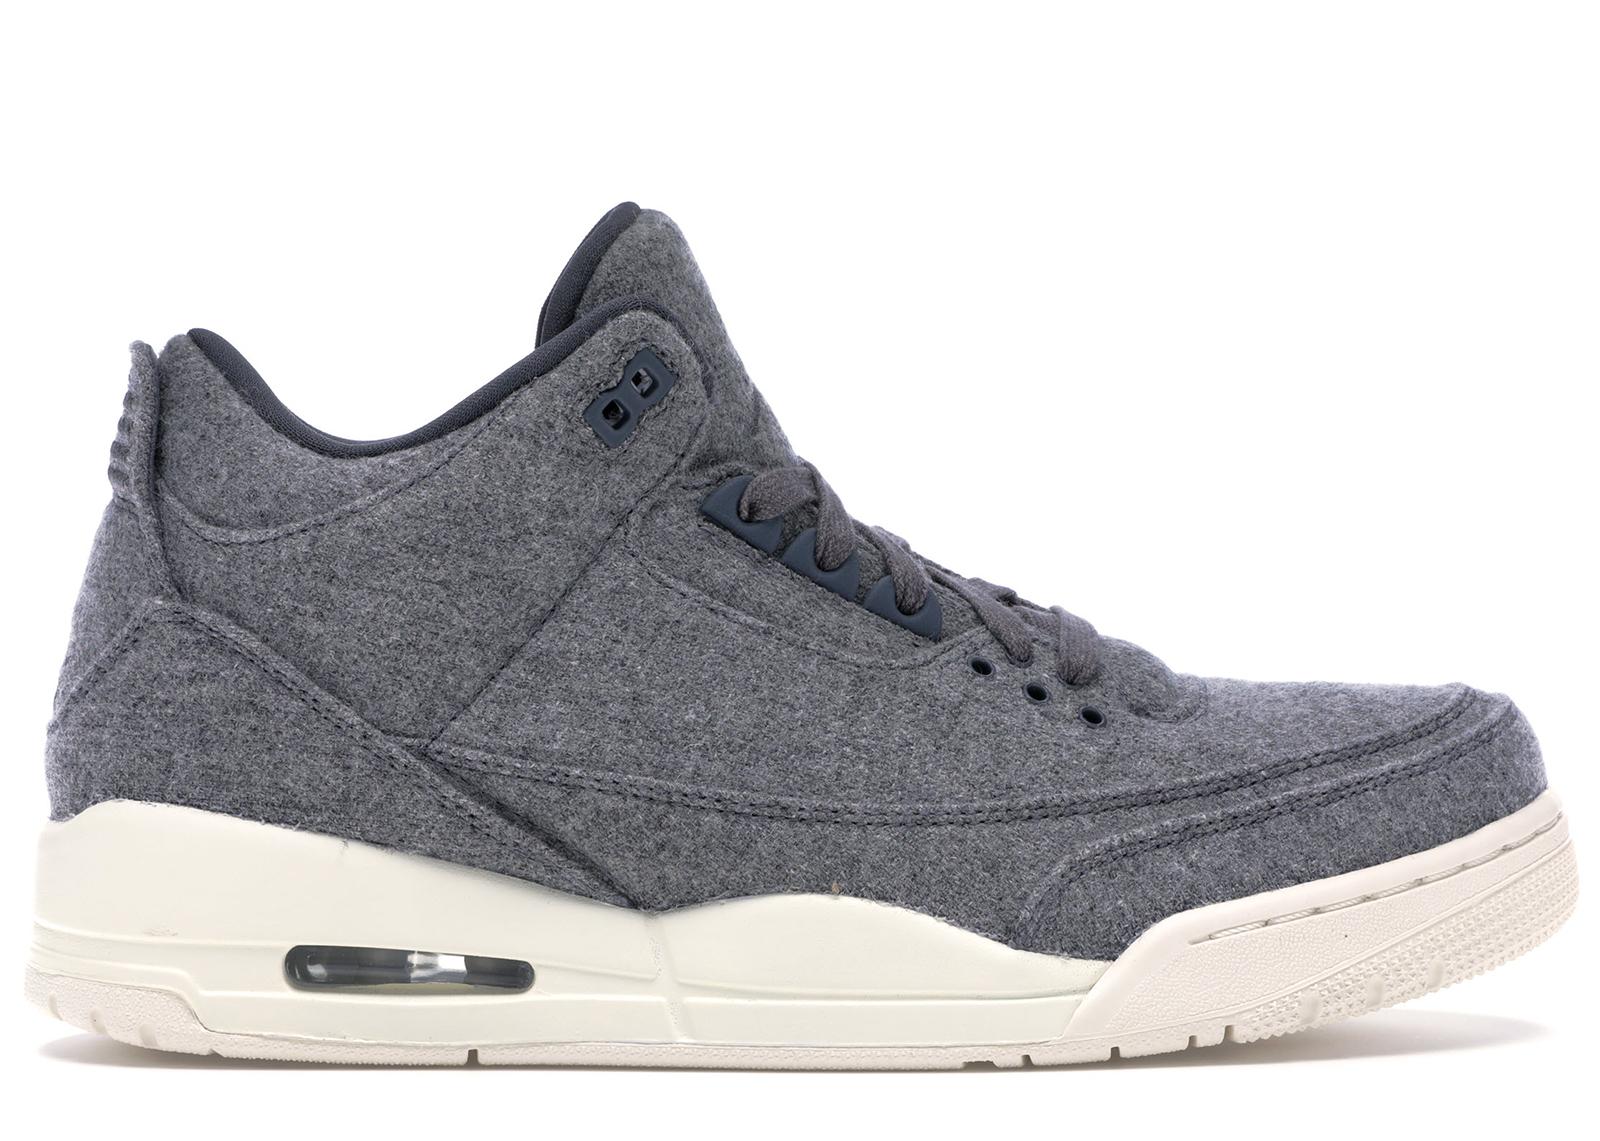 Jordan 3 Retro Wool - 854263-004